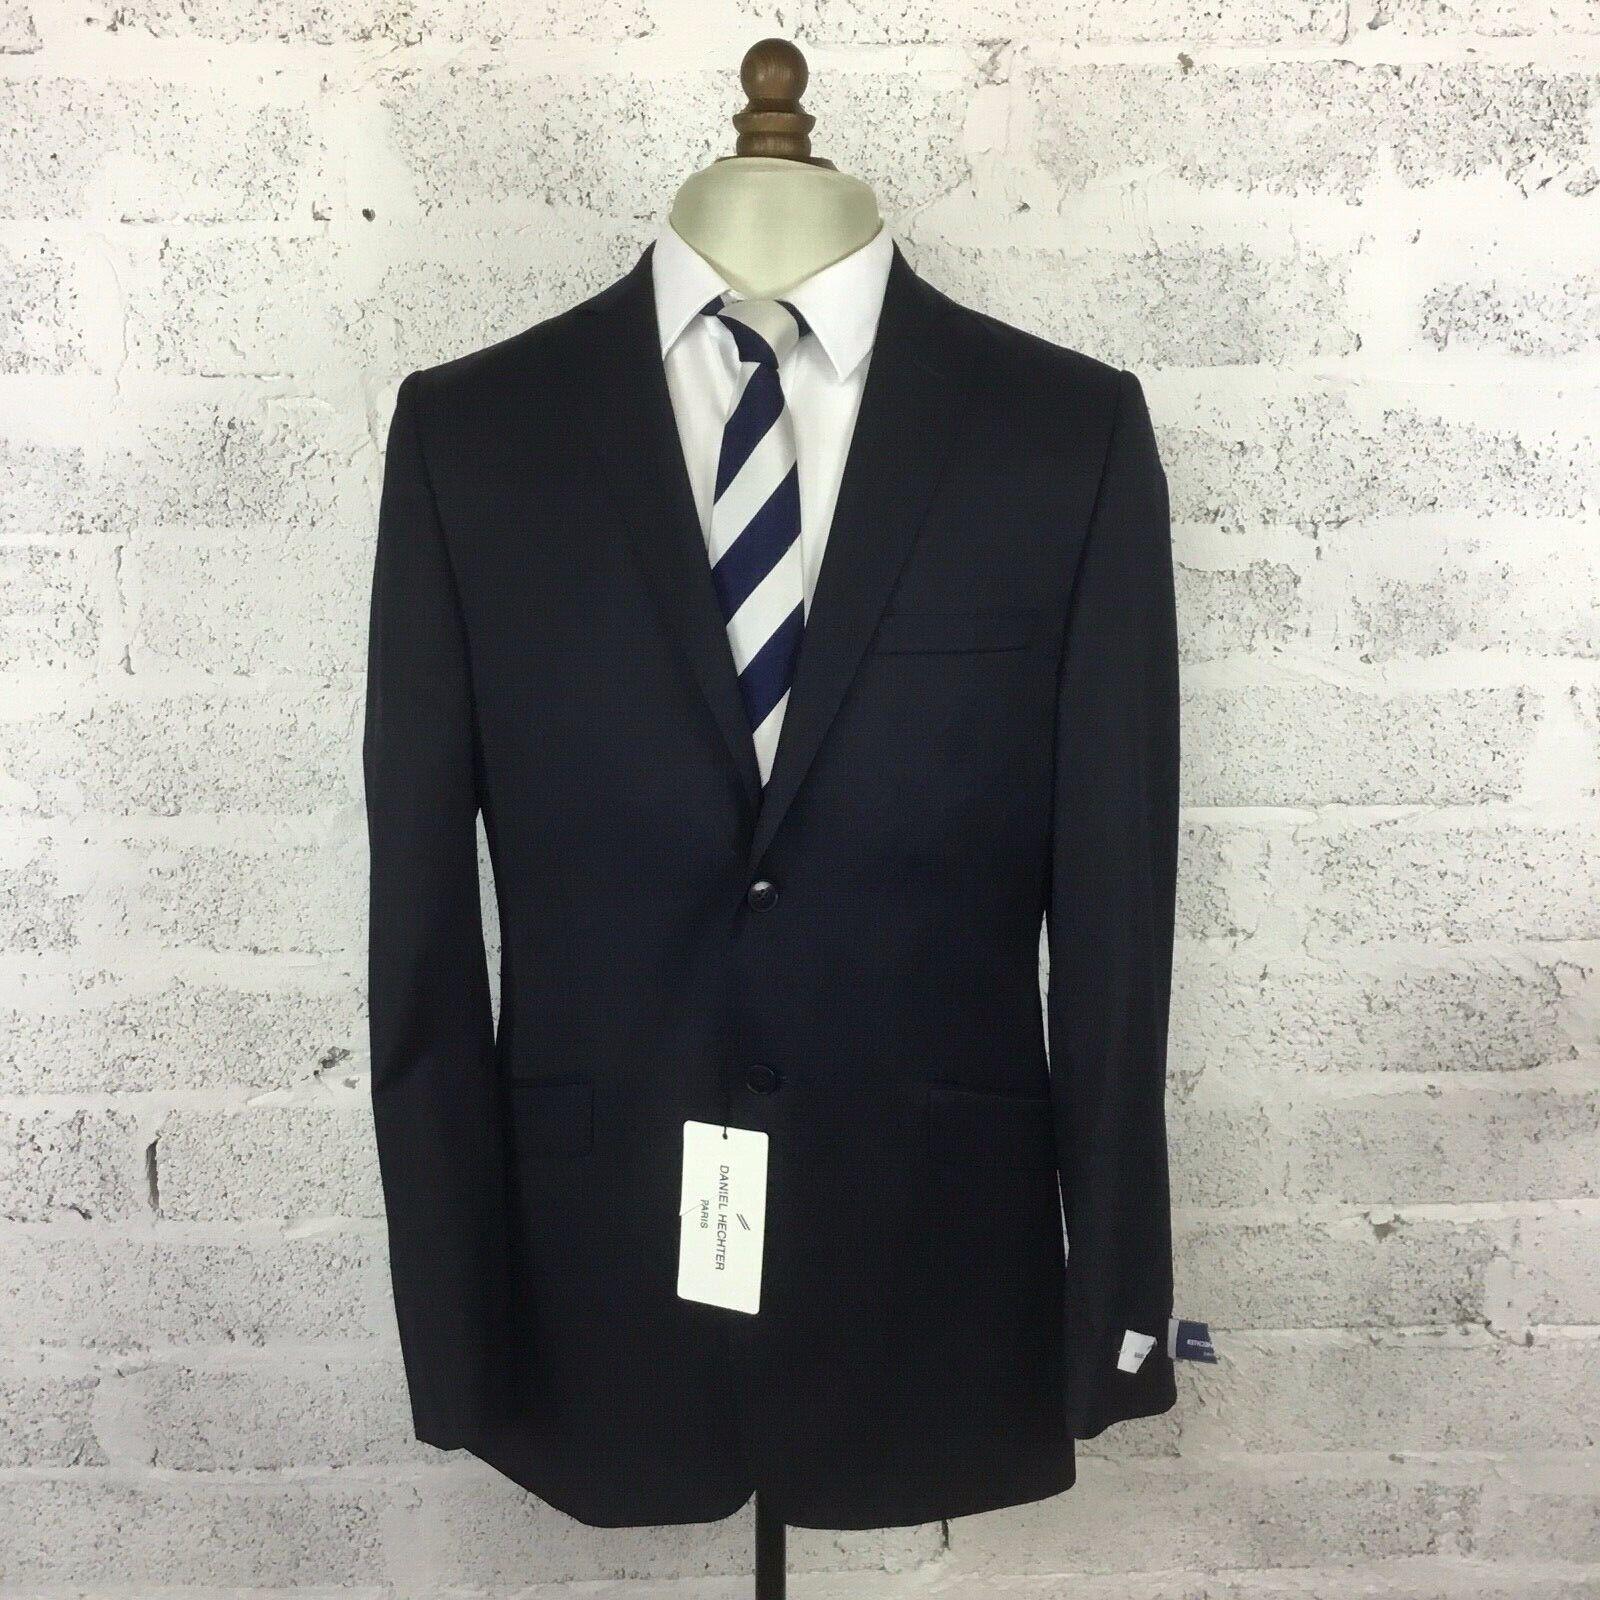 Daniel Hechter herren Pindot Navy Suit jacke wolleMix  180 BNWT Größe 40L Fab